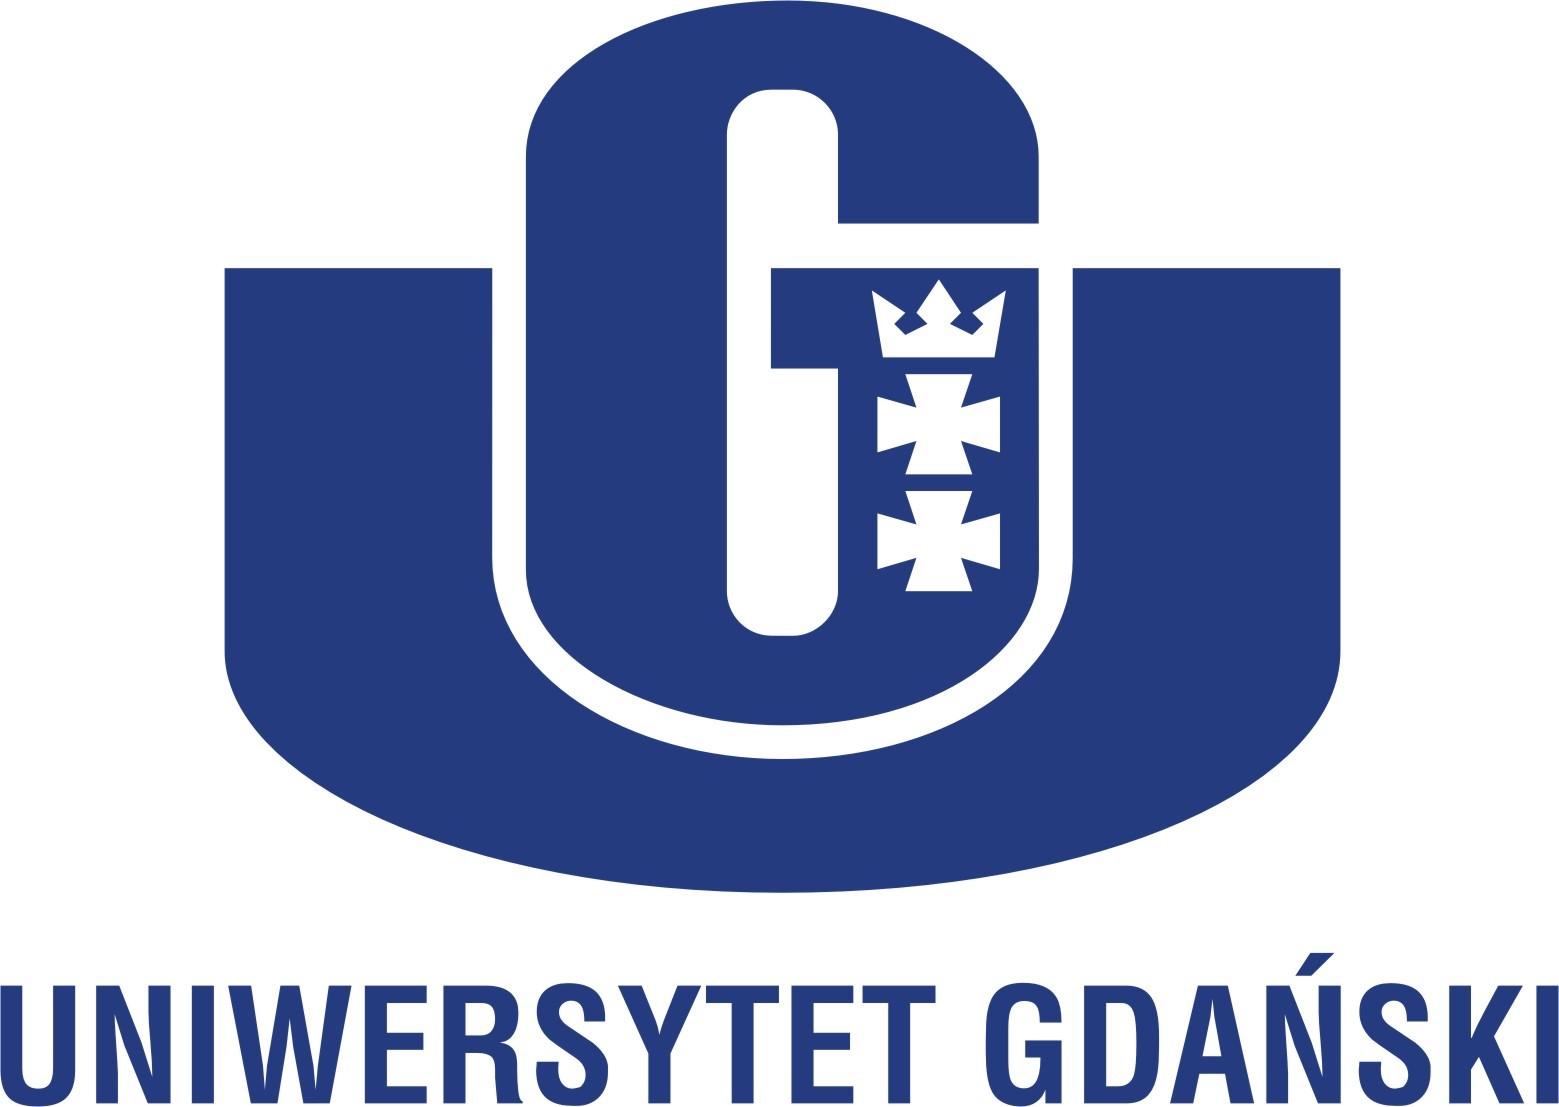 Uniwersytet Gdański Image